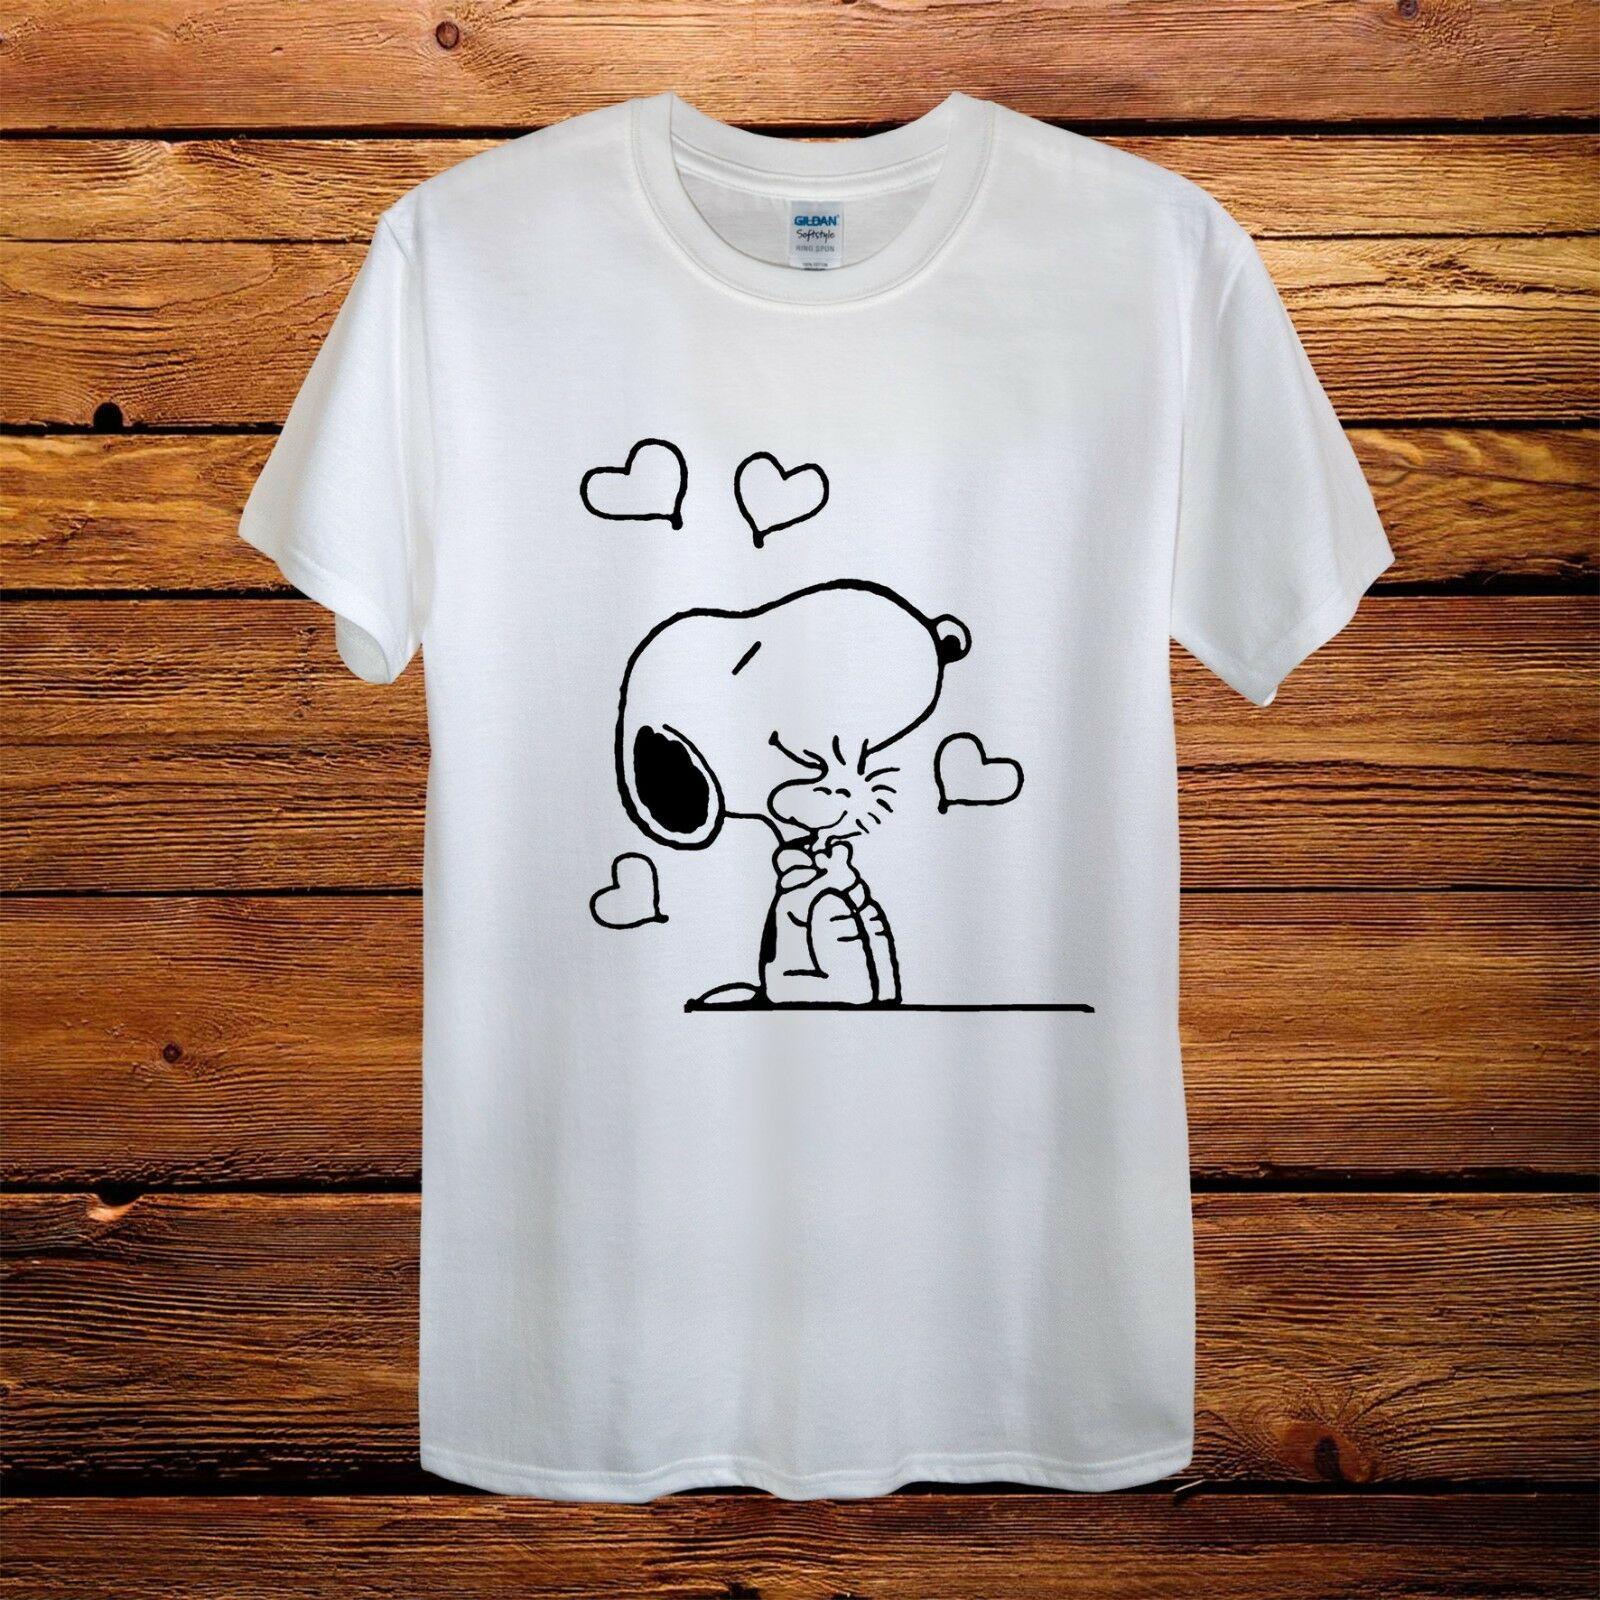 Snoopie Dog Peanuts Love Hug Top Design T-Shirt Men Unisex Women Fitted GiftMale Hip Hop Funny Tee Shirts Cheap Wholesale